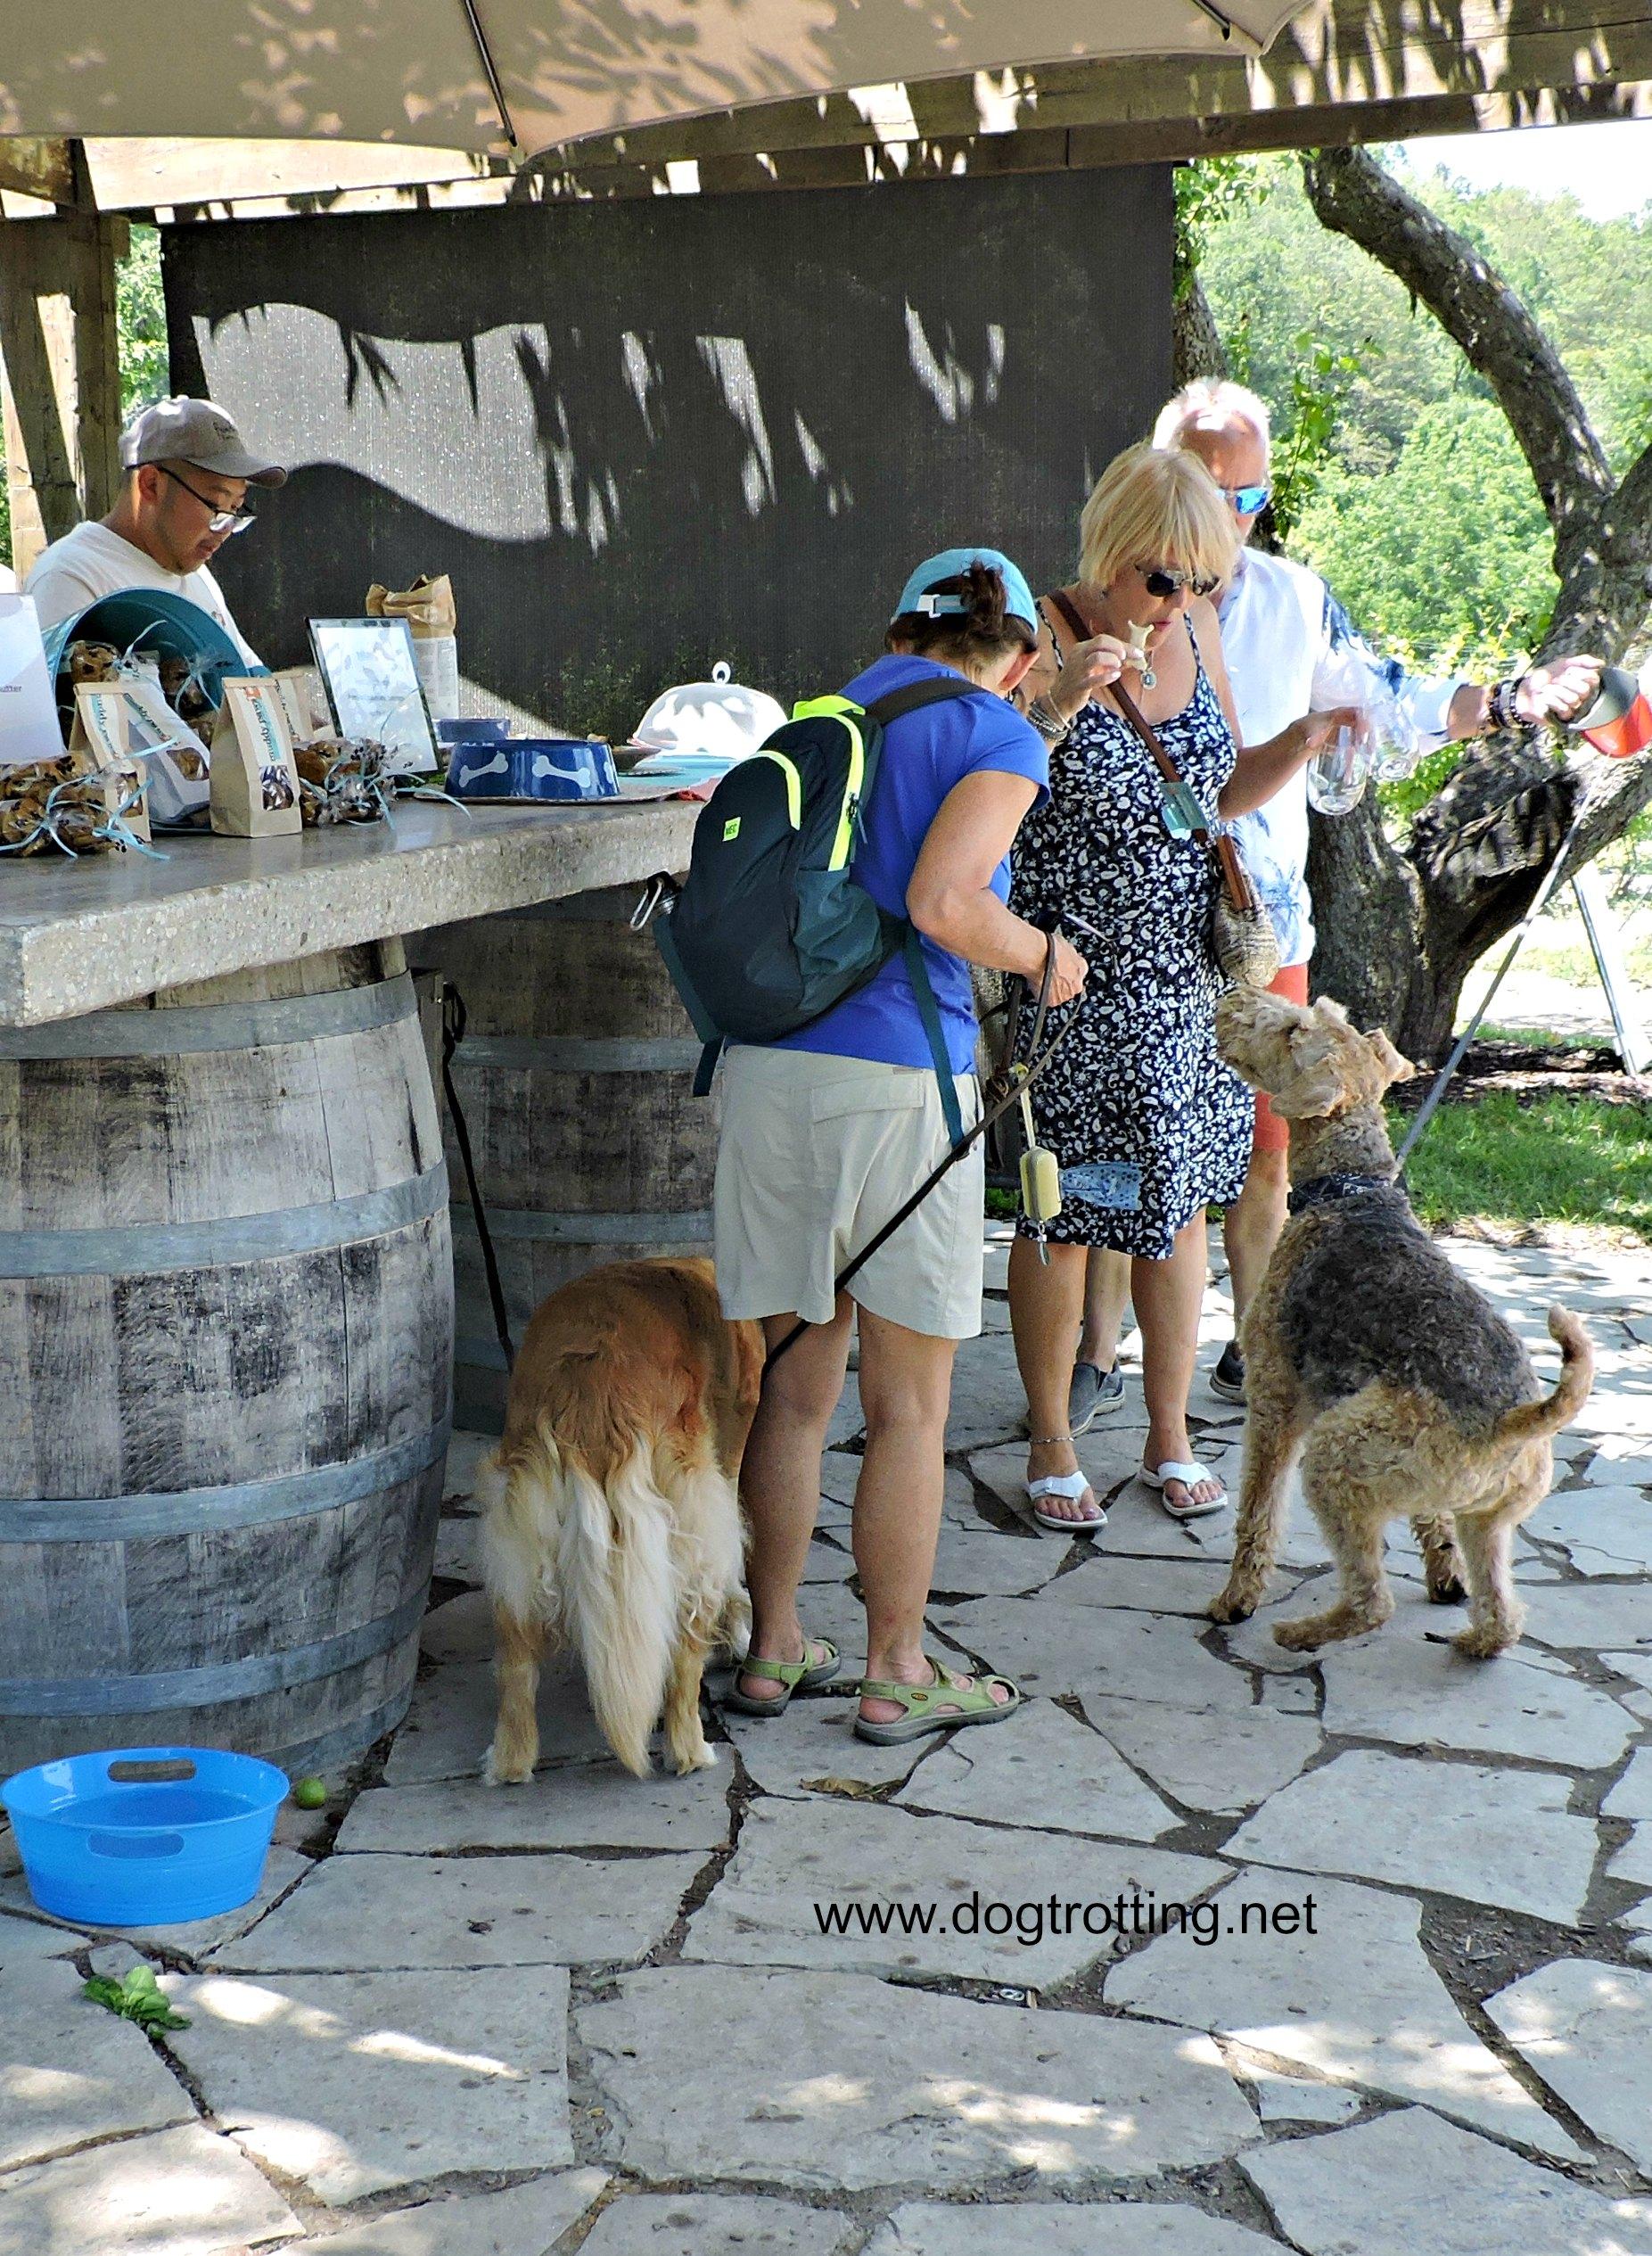 muddy paws wine and dog festival Vineland Ontario dogtrotting.net